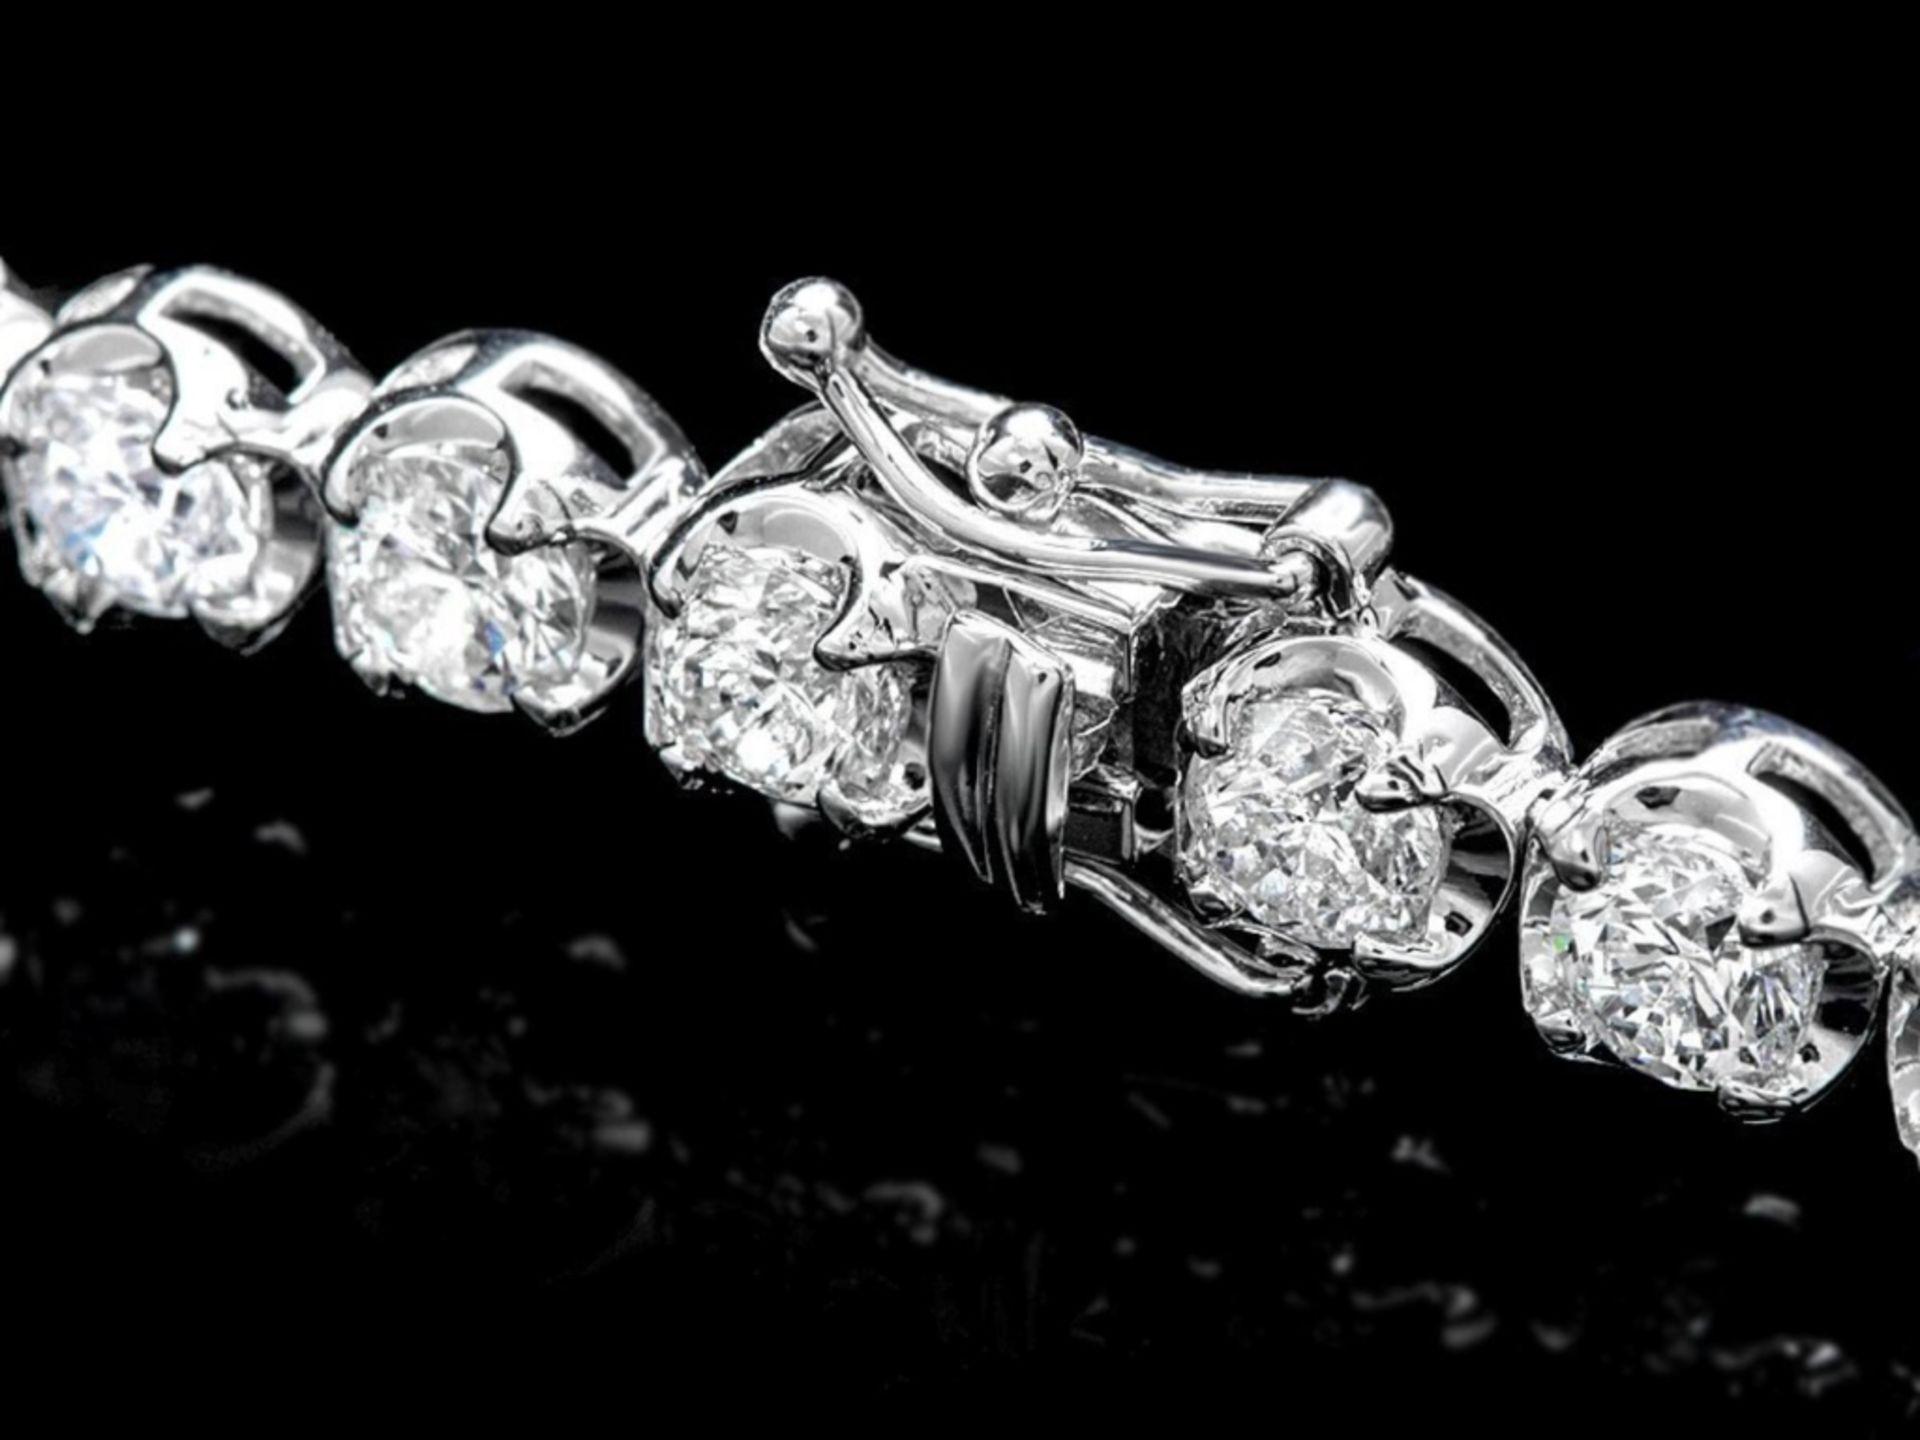 18k White Gold 10.00ct Diamond Tennis Bracelet - Image 2 of 3